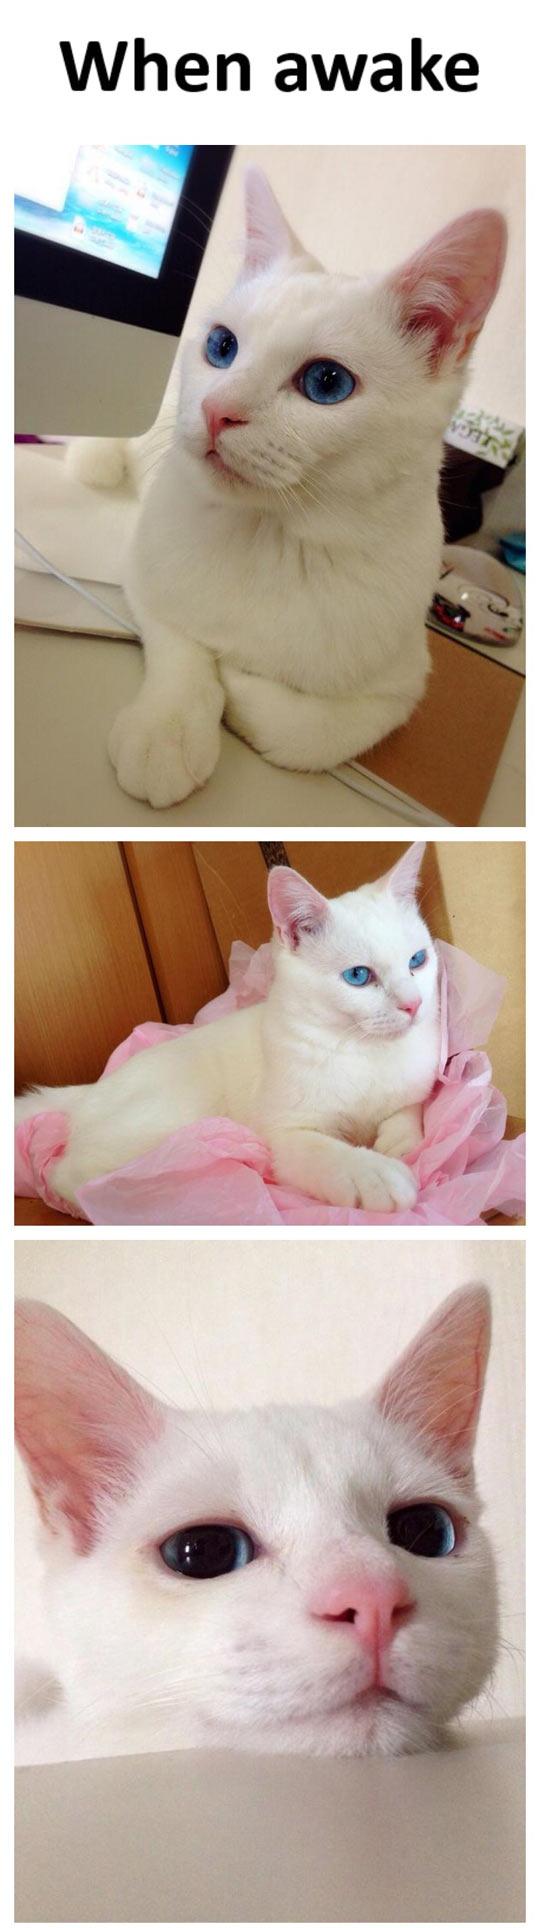 When A Gorgeous Cat Sleeps